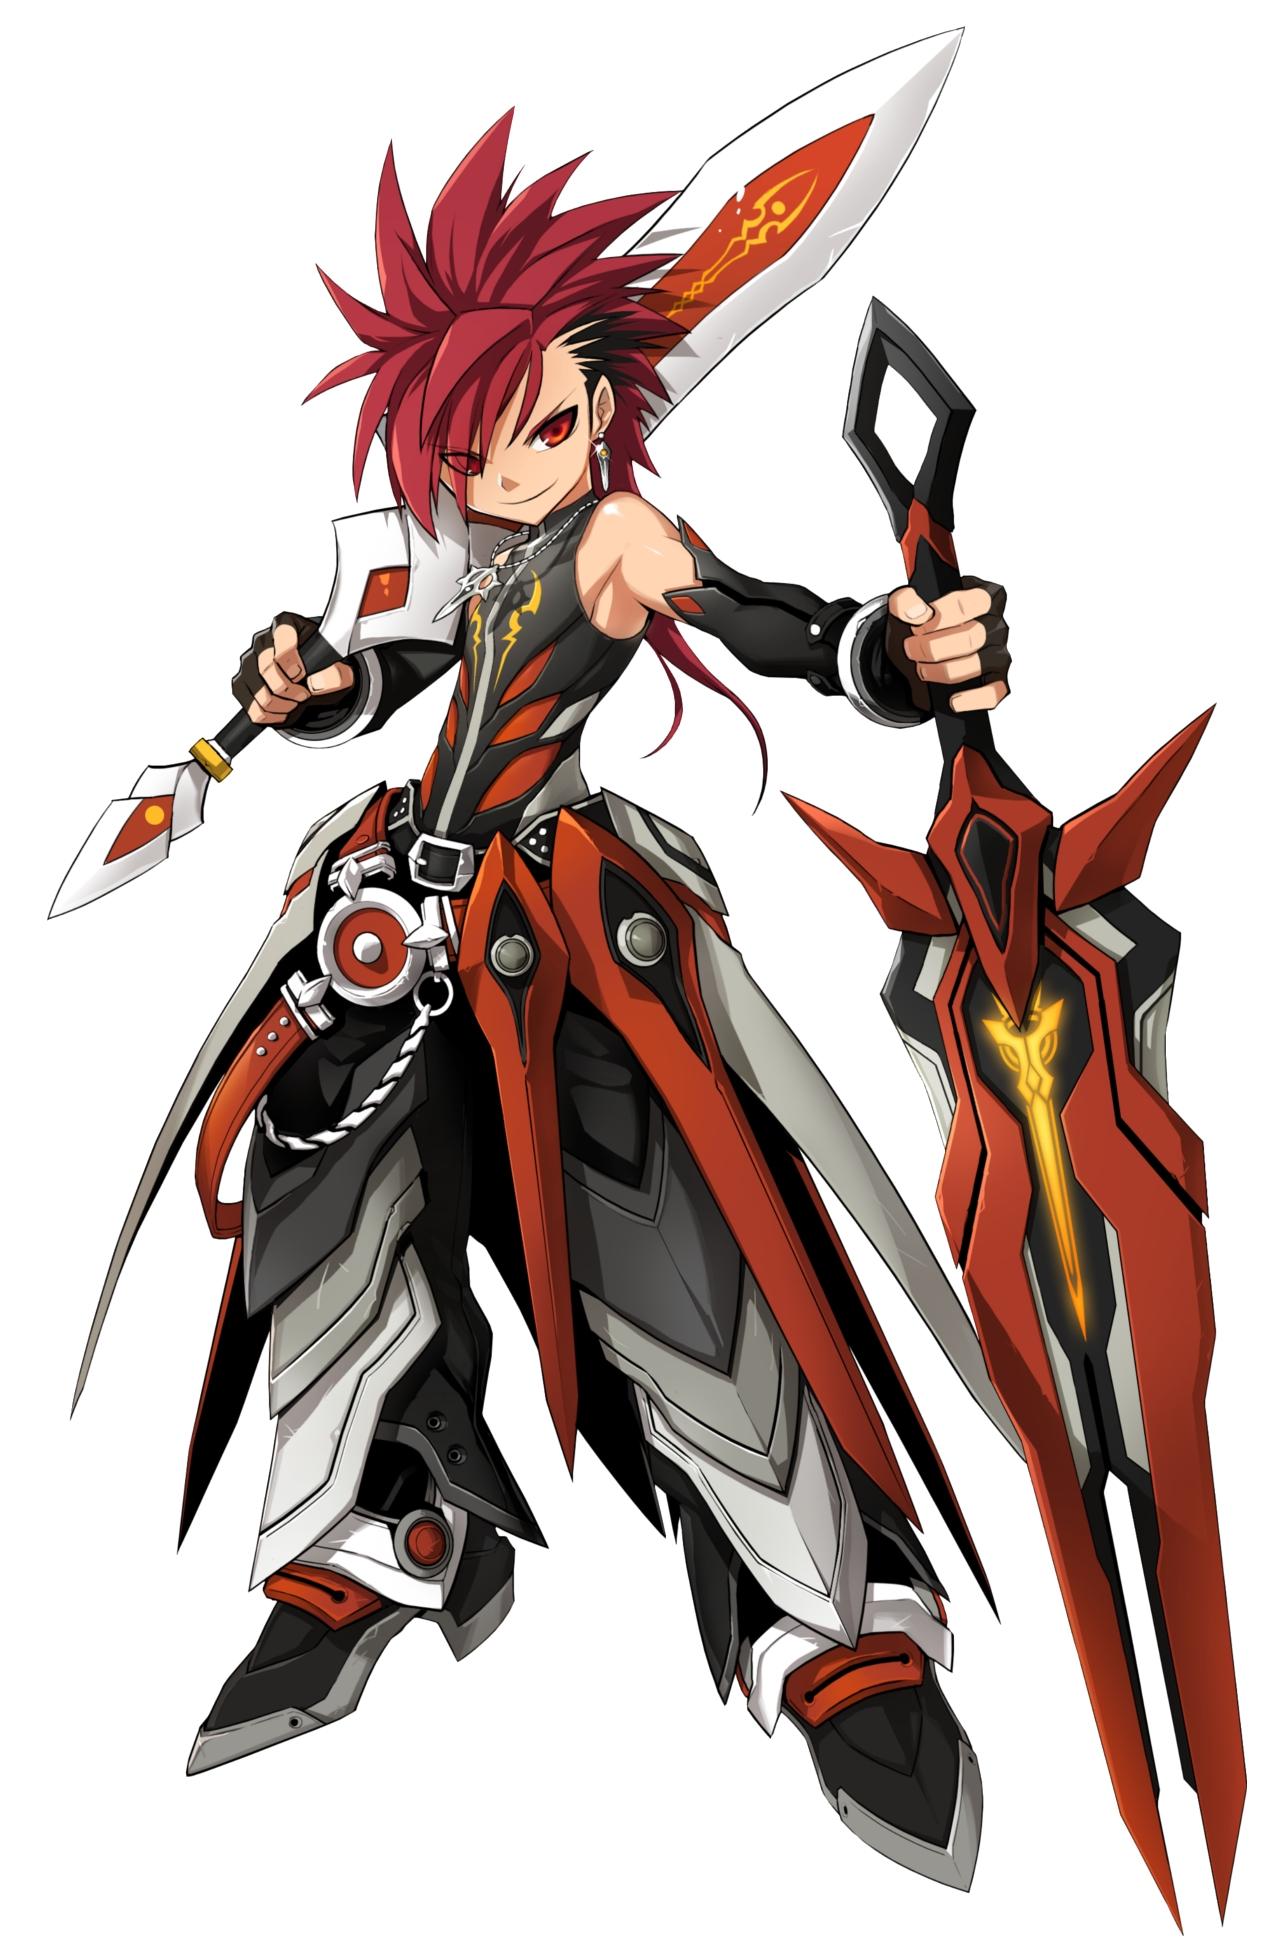 Anime Characters Use Dual Swords : Infinity sword elsword zerochan